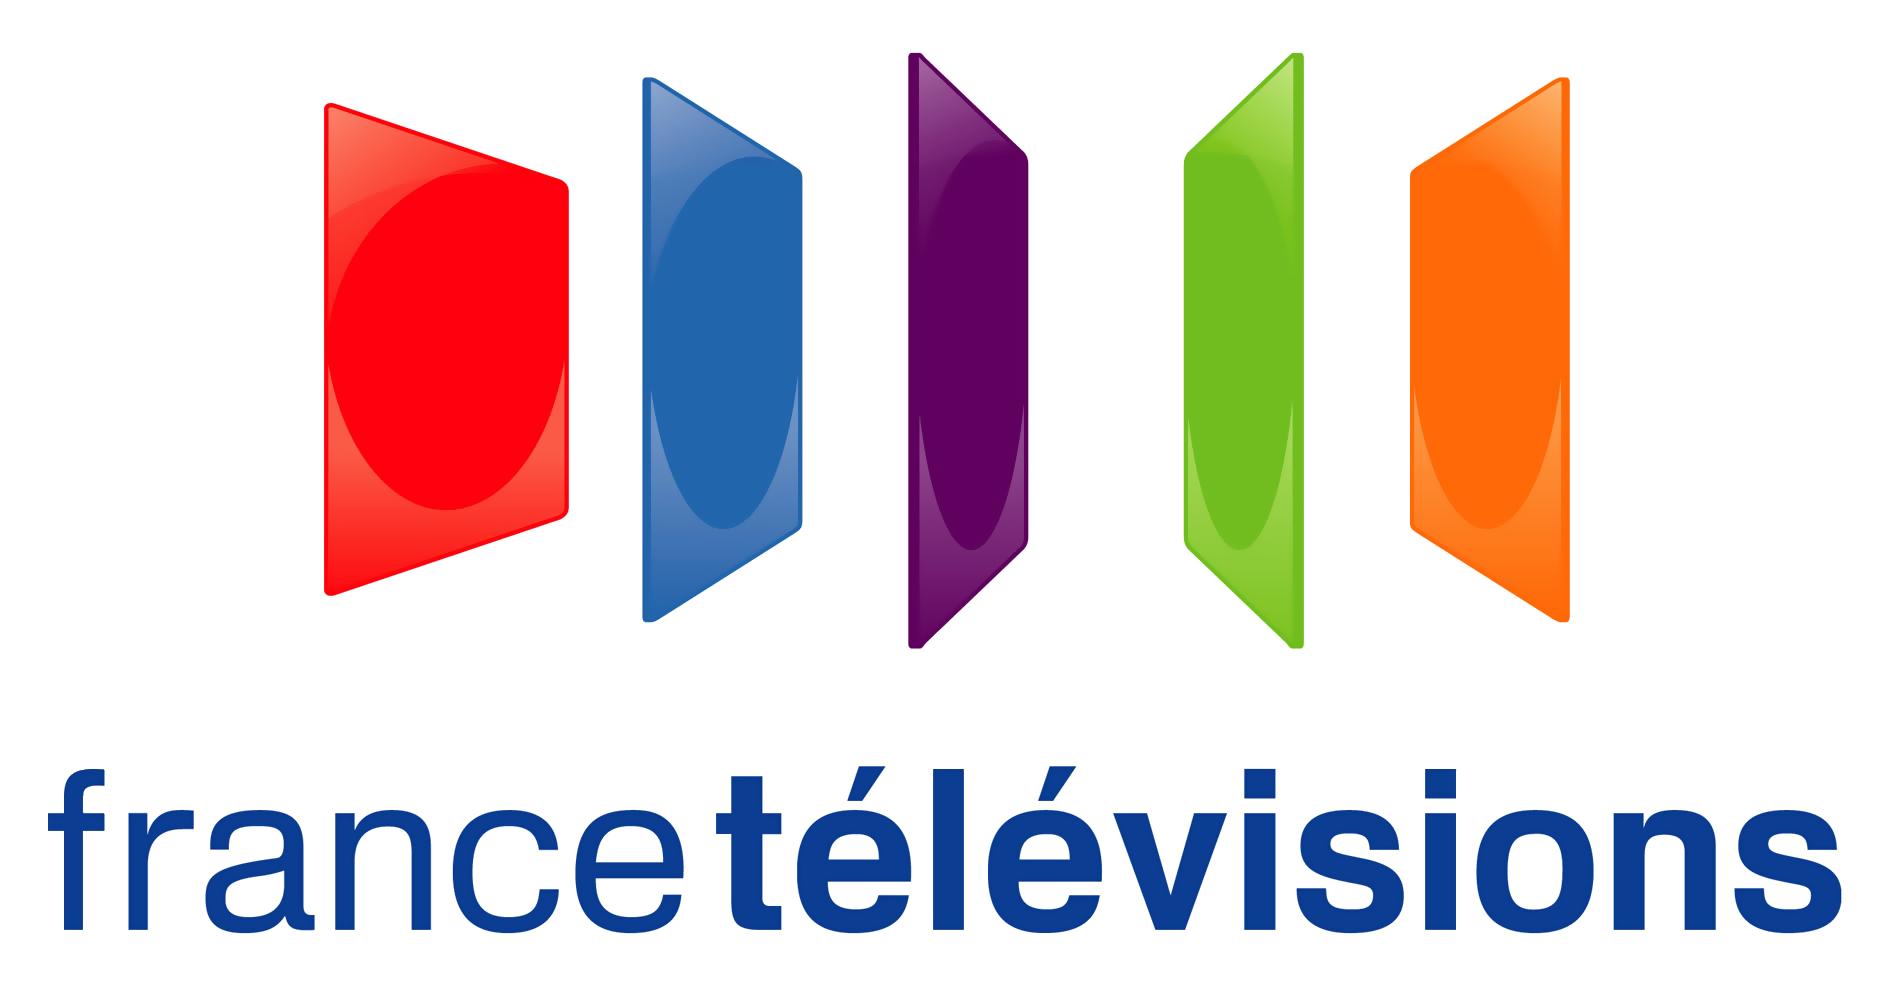 France_televisions_2008_logo